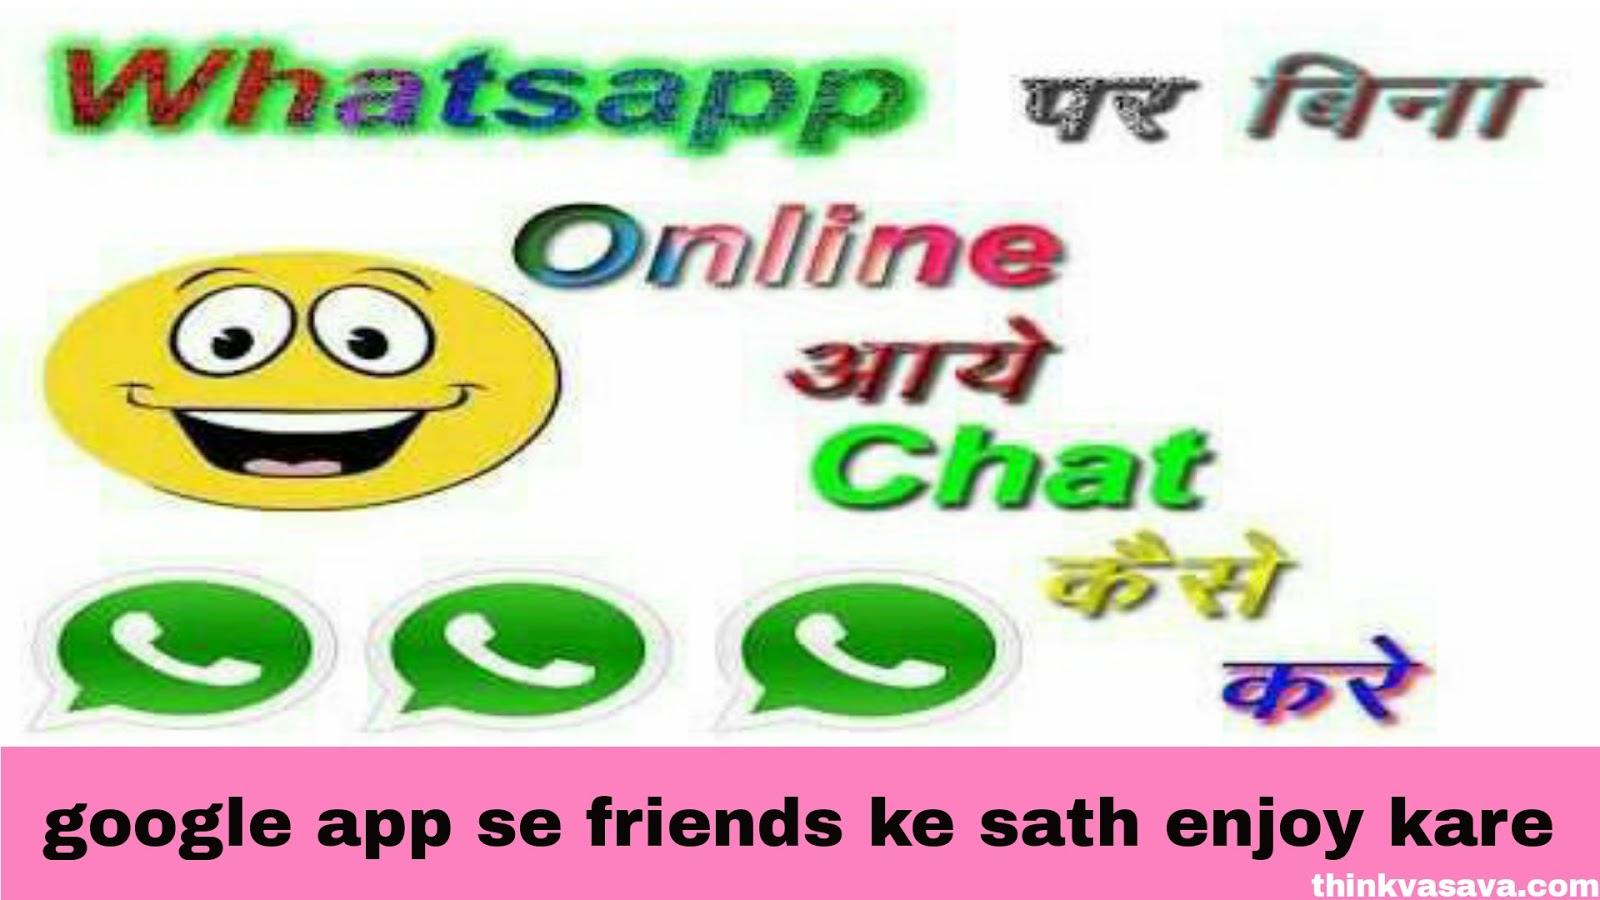 Wallpaper download karne ka app - Wallpaper Download Karne Ka App Whatsapp Par Bina Online Aaye Chat Kare Google App Se